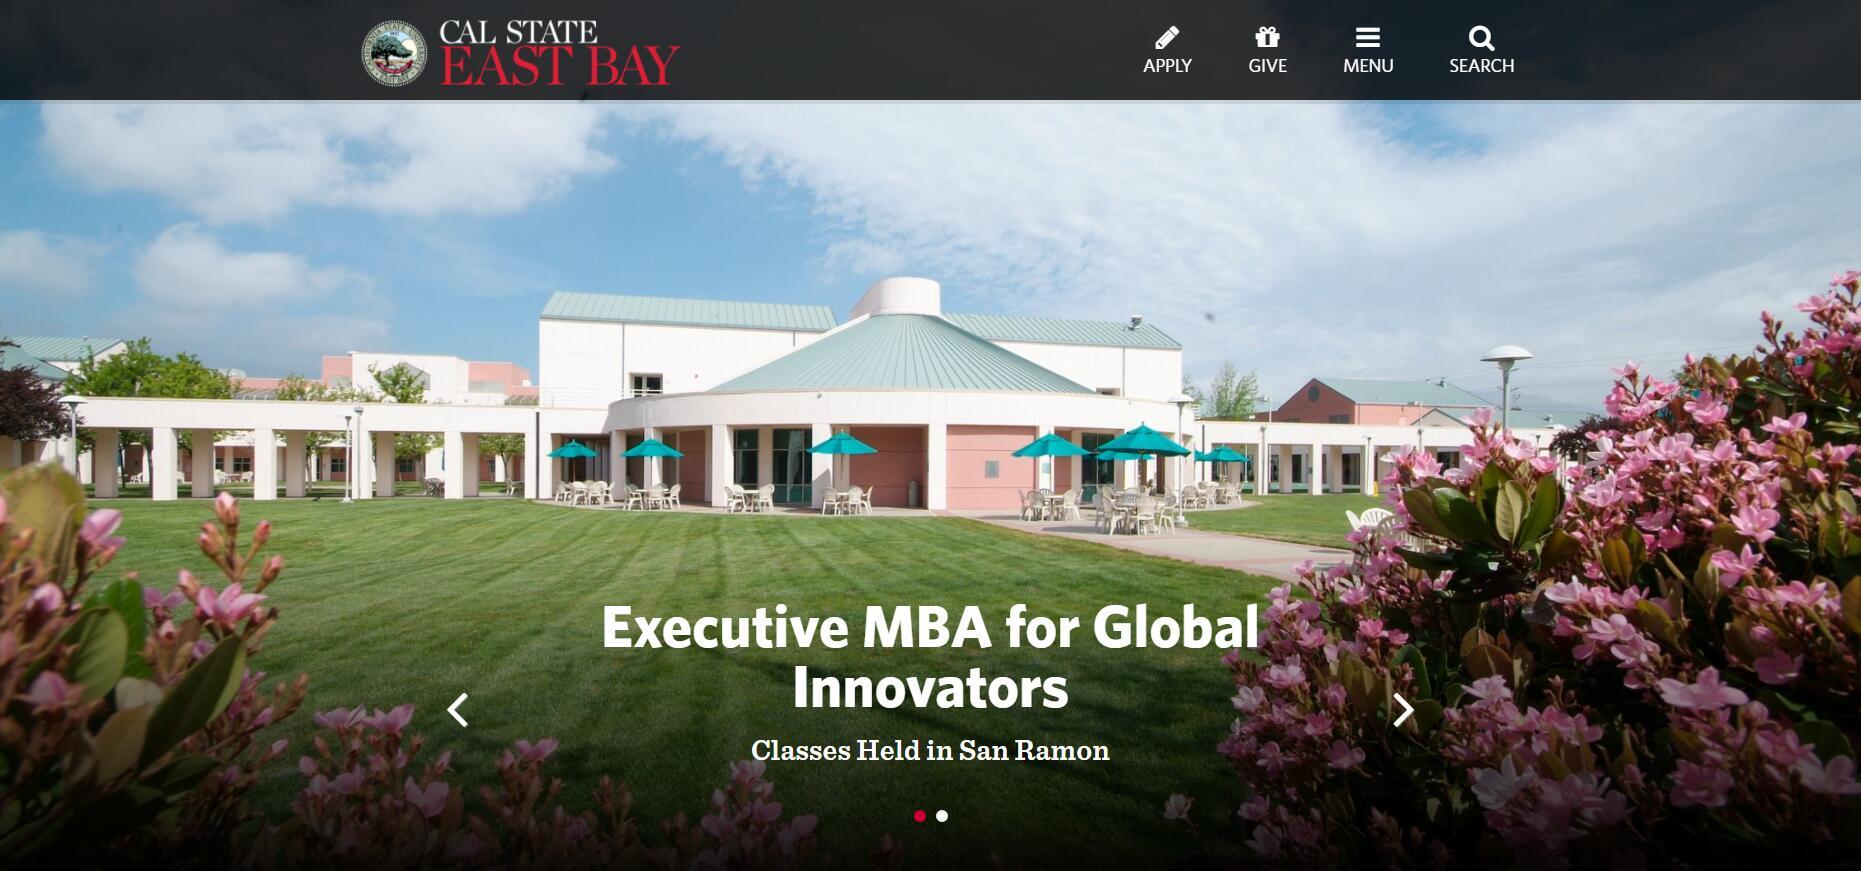 CSUEB Executive MBA for Global Innovators